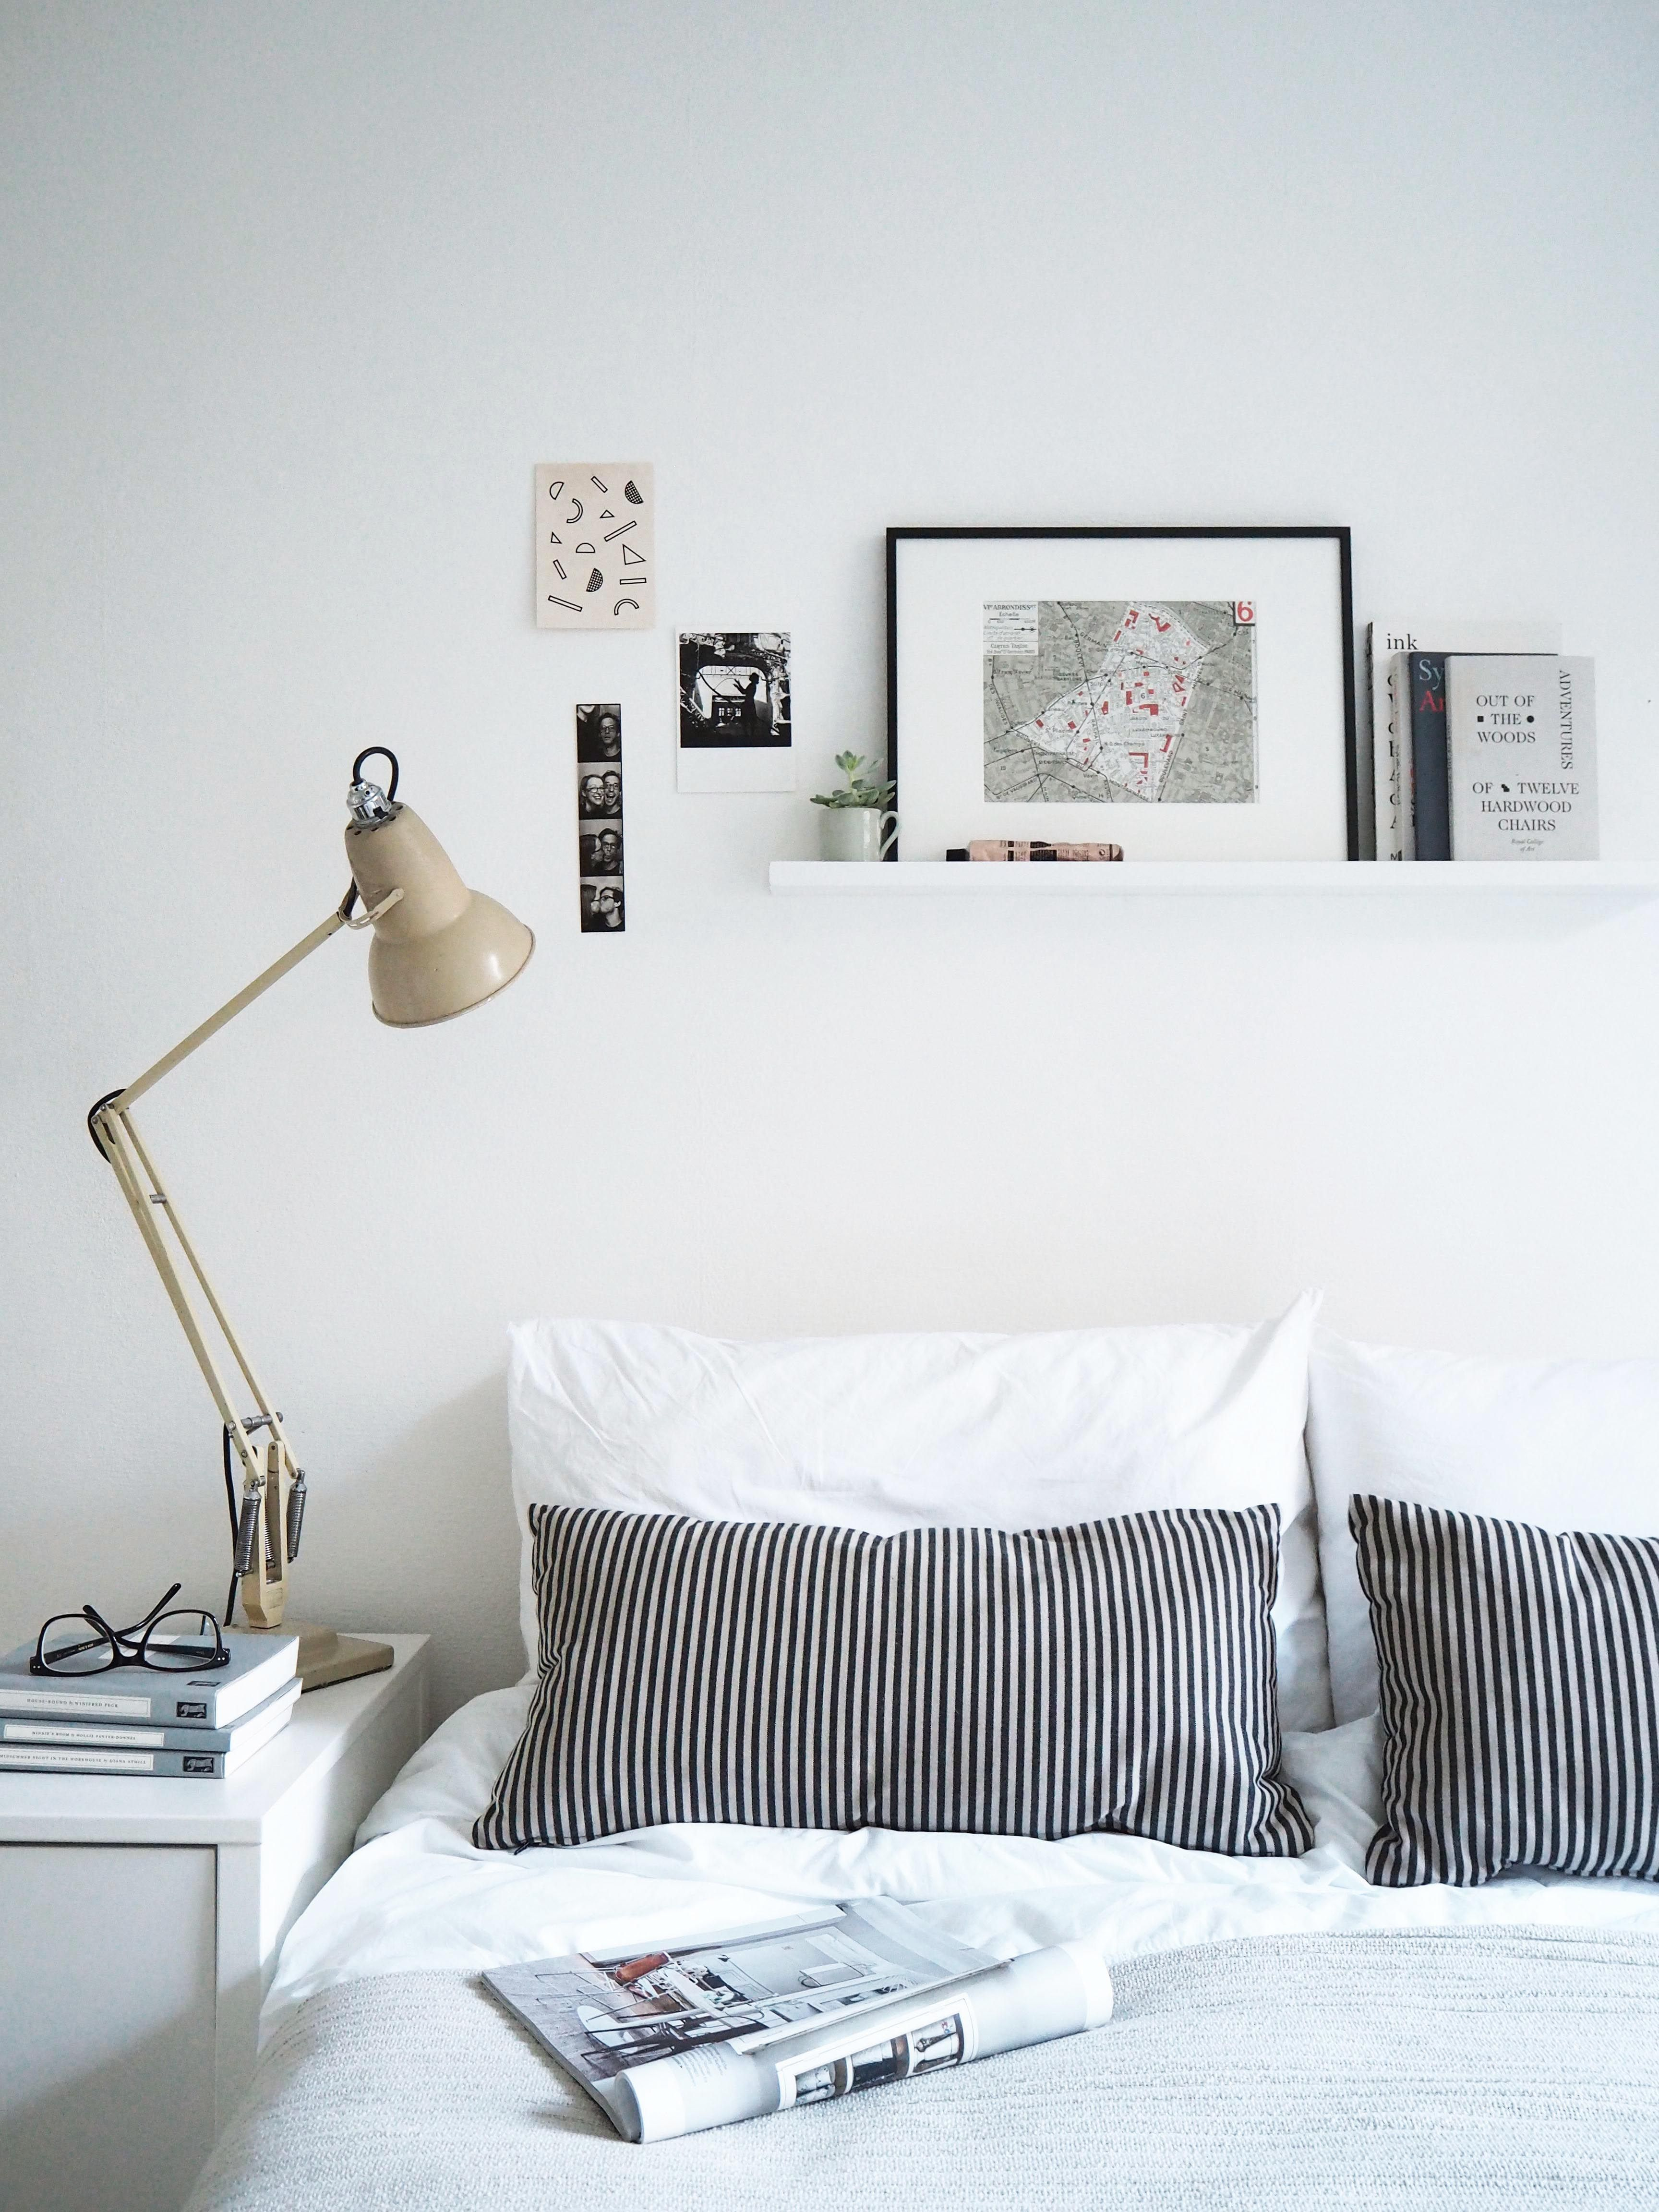 home tips: styling a picture ledge | Pinterest - Slaapkamer ...